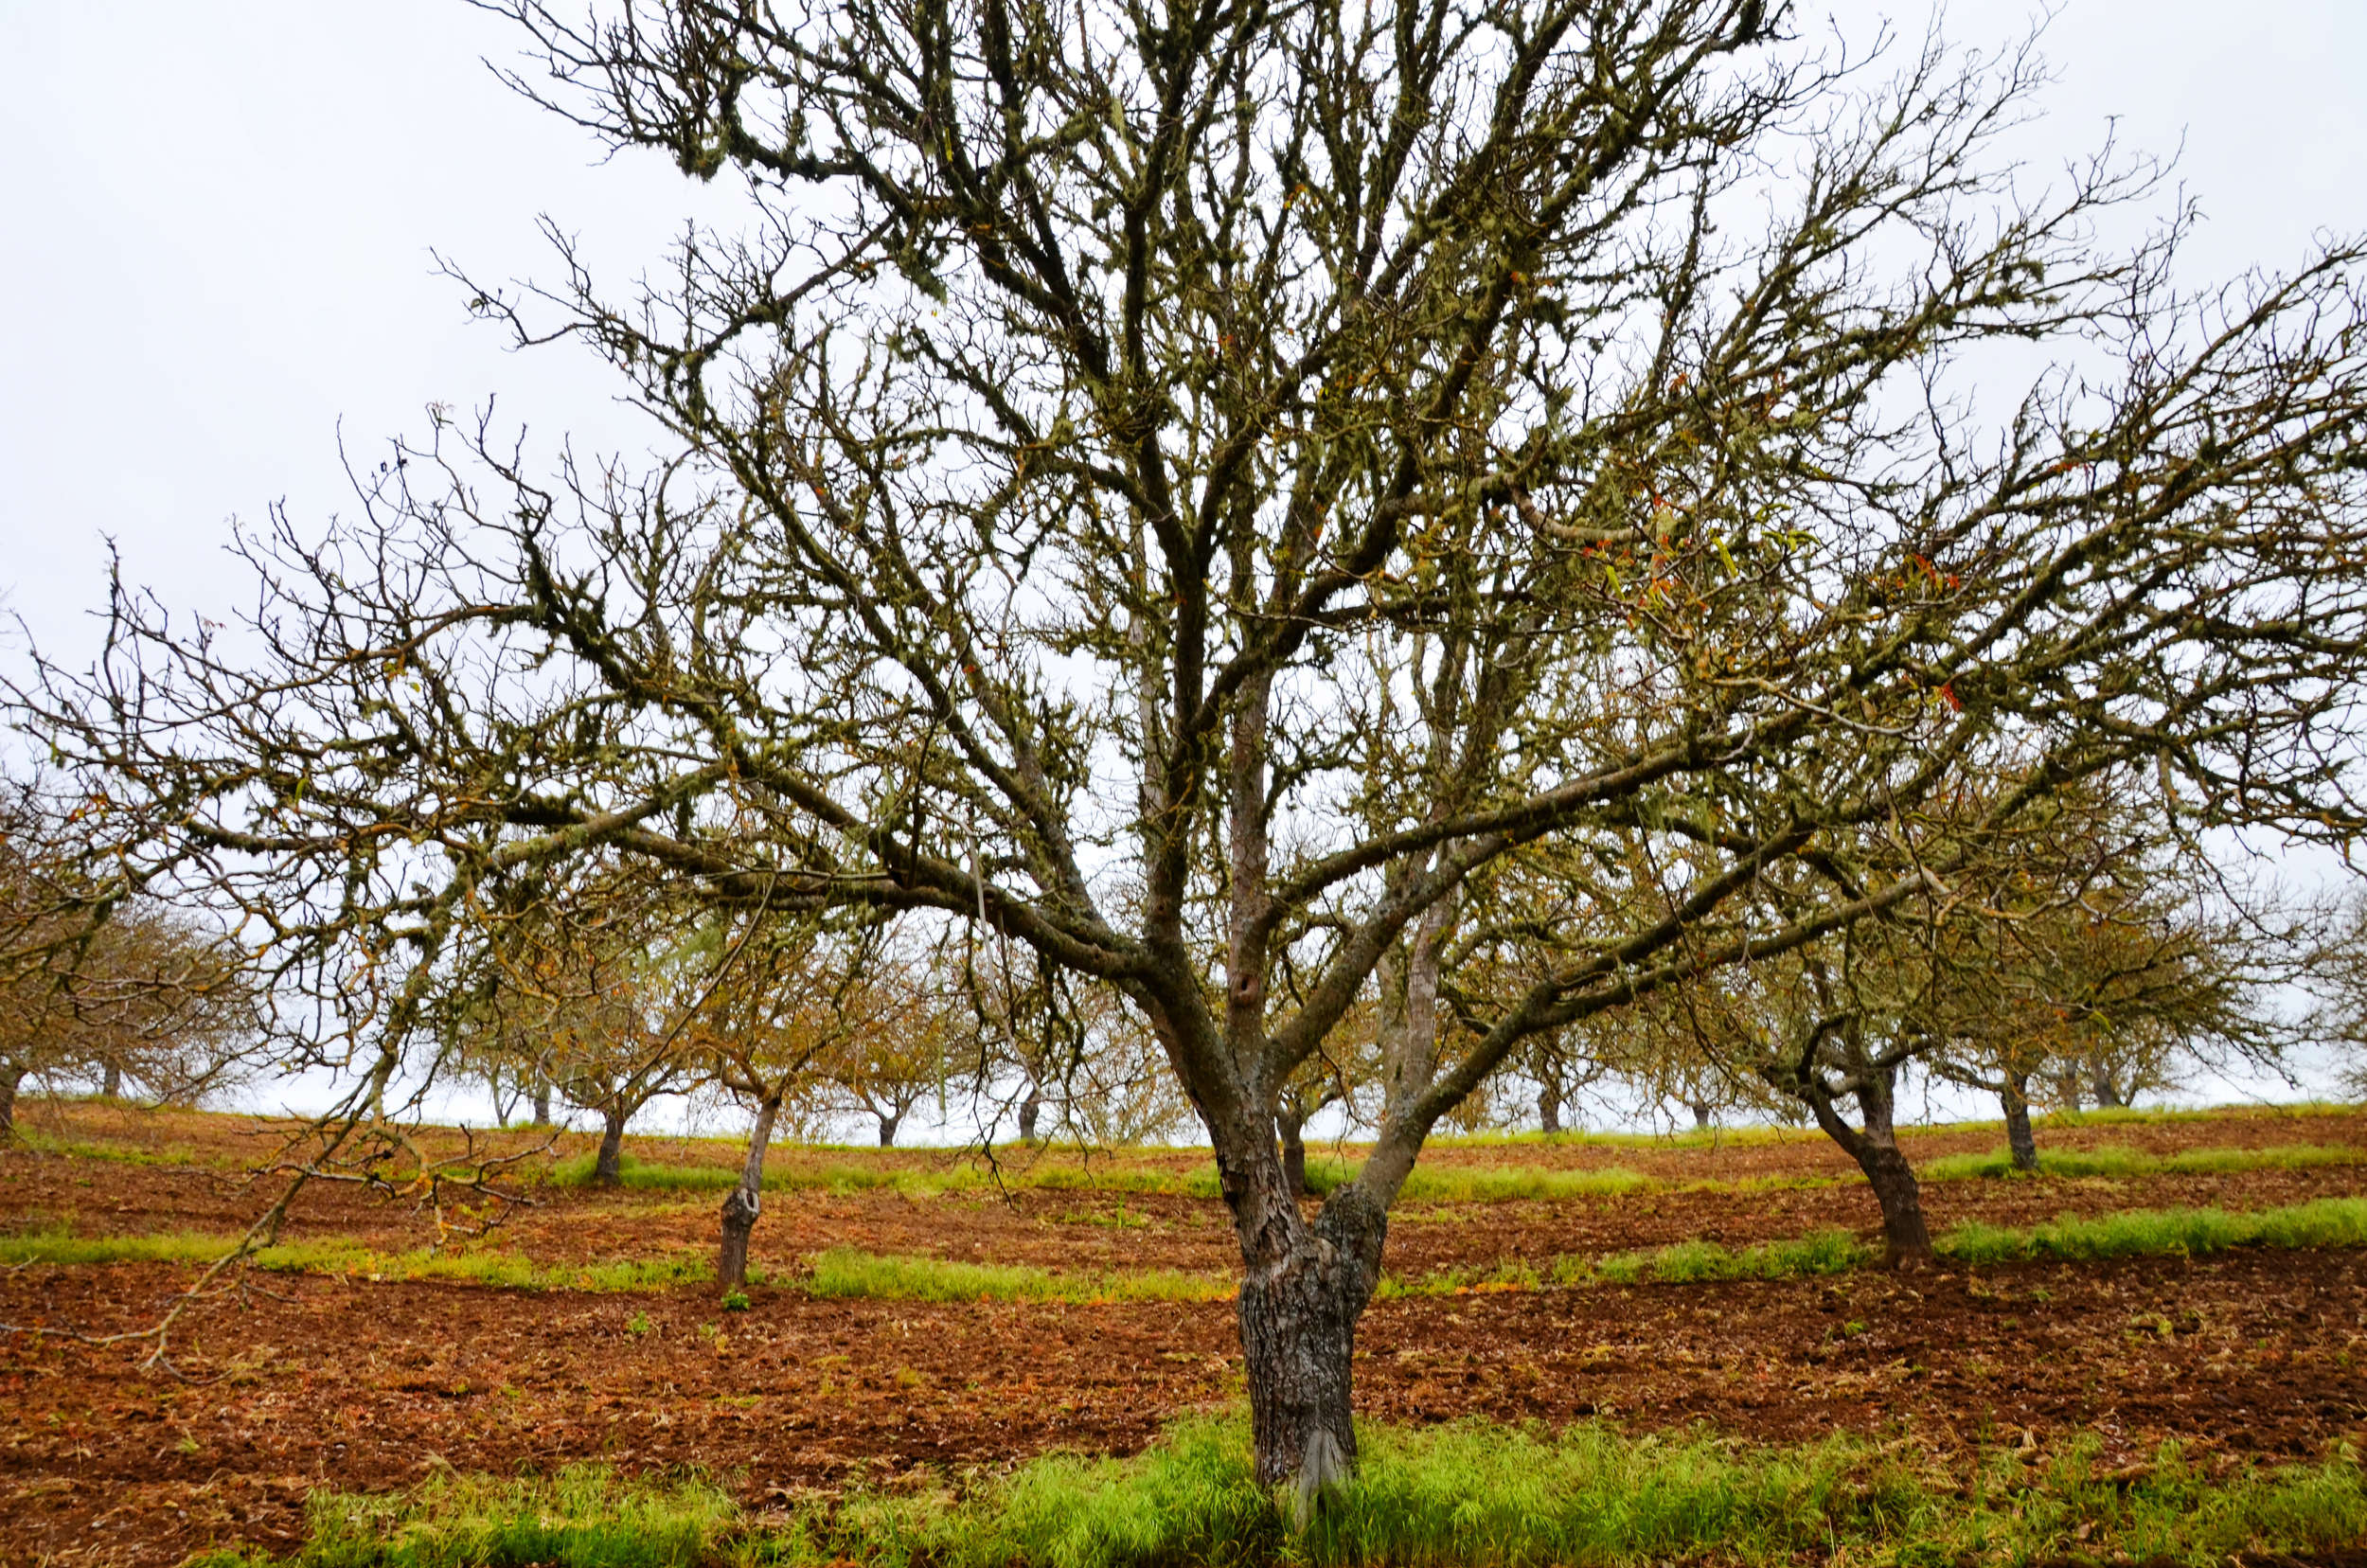 flavor-walnut-pic-3-28.jpg